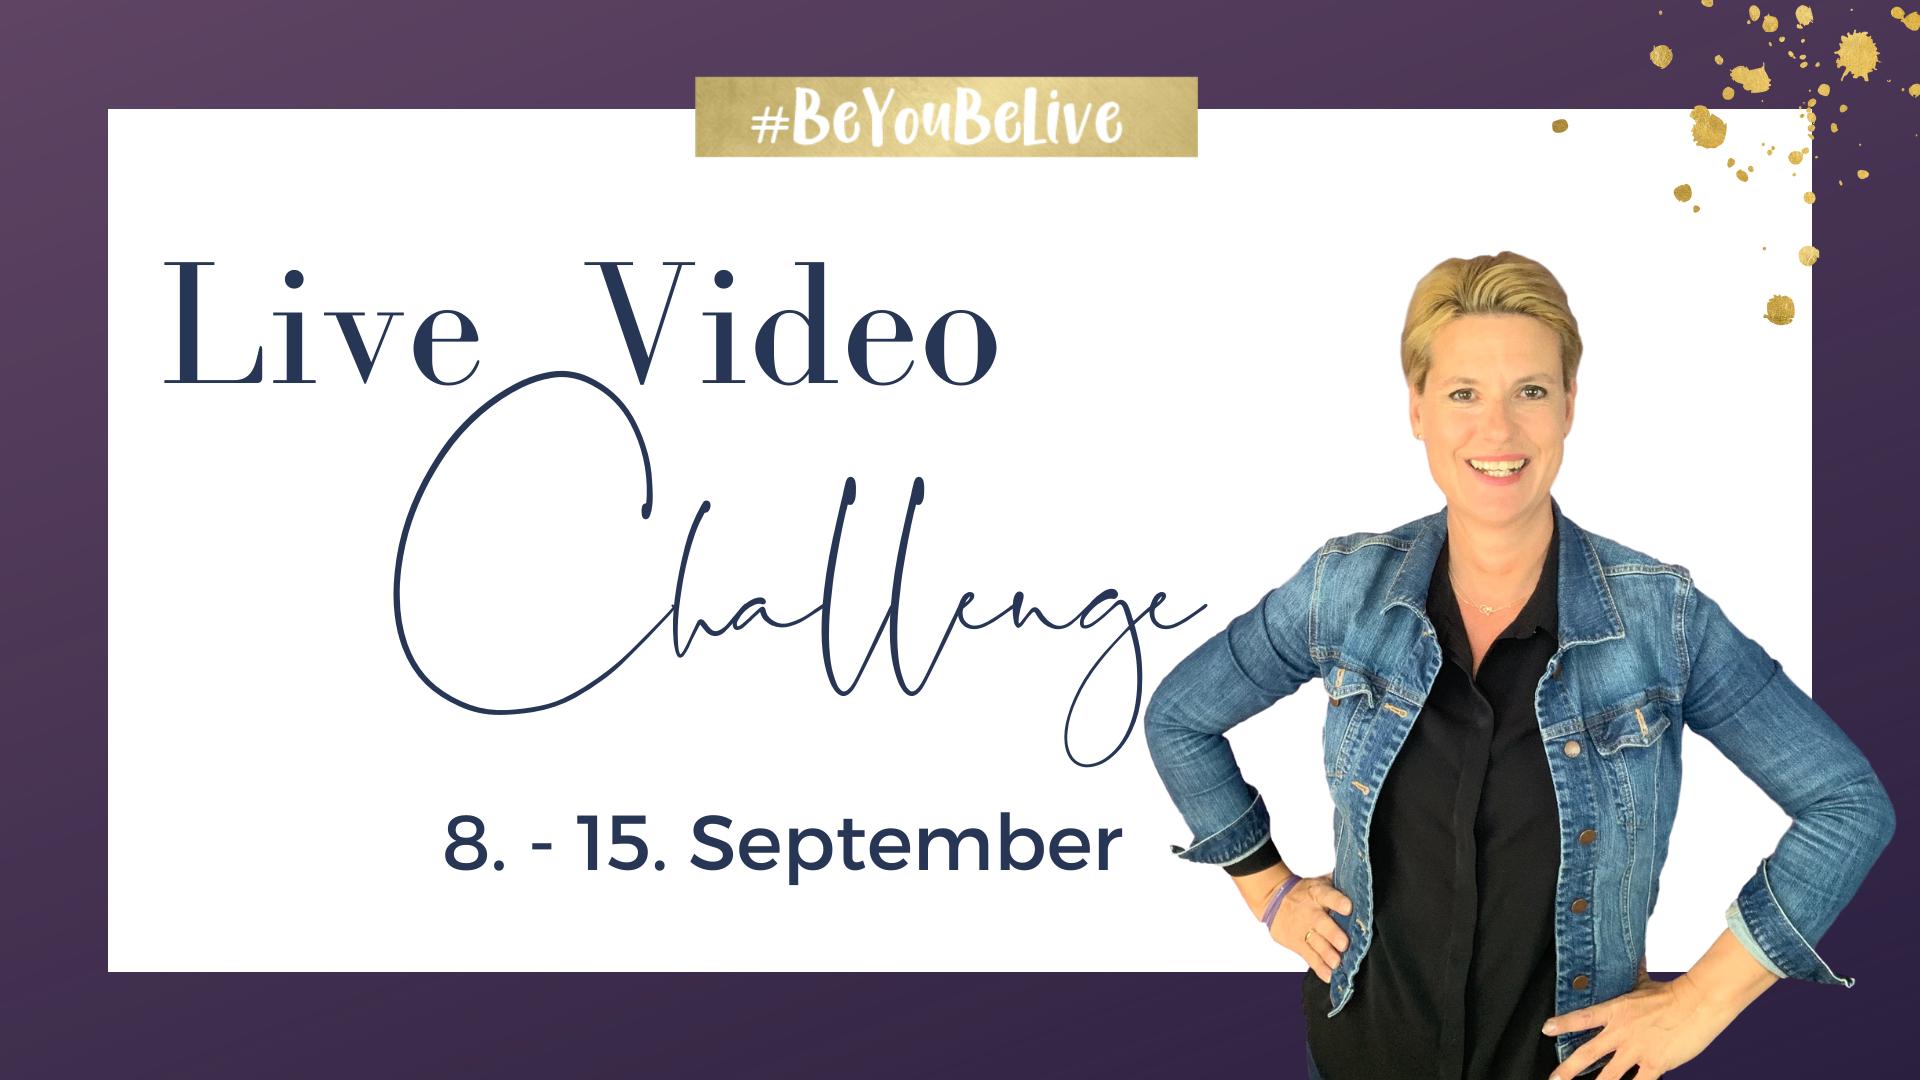 Live Video Challenge